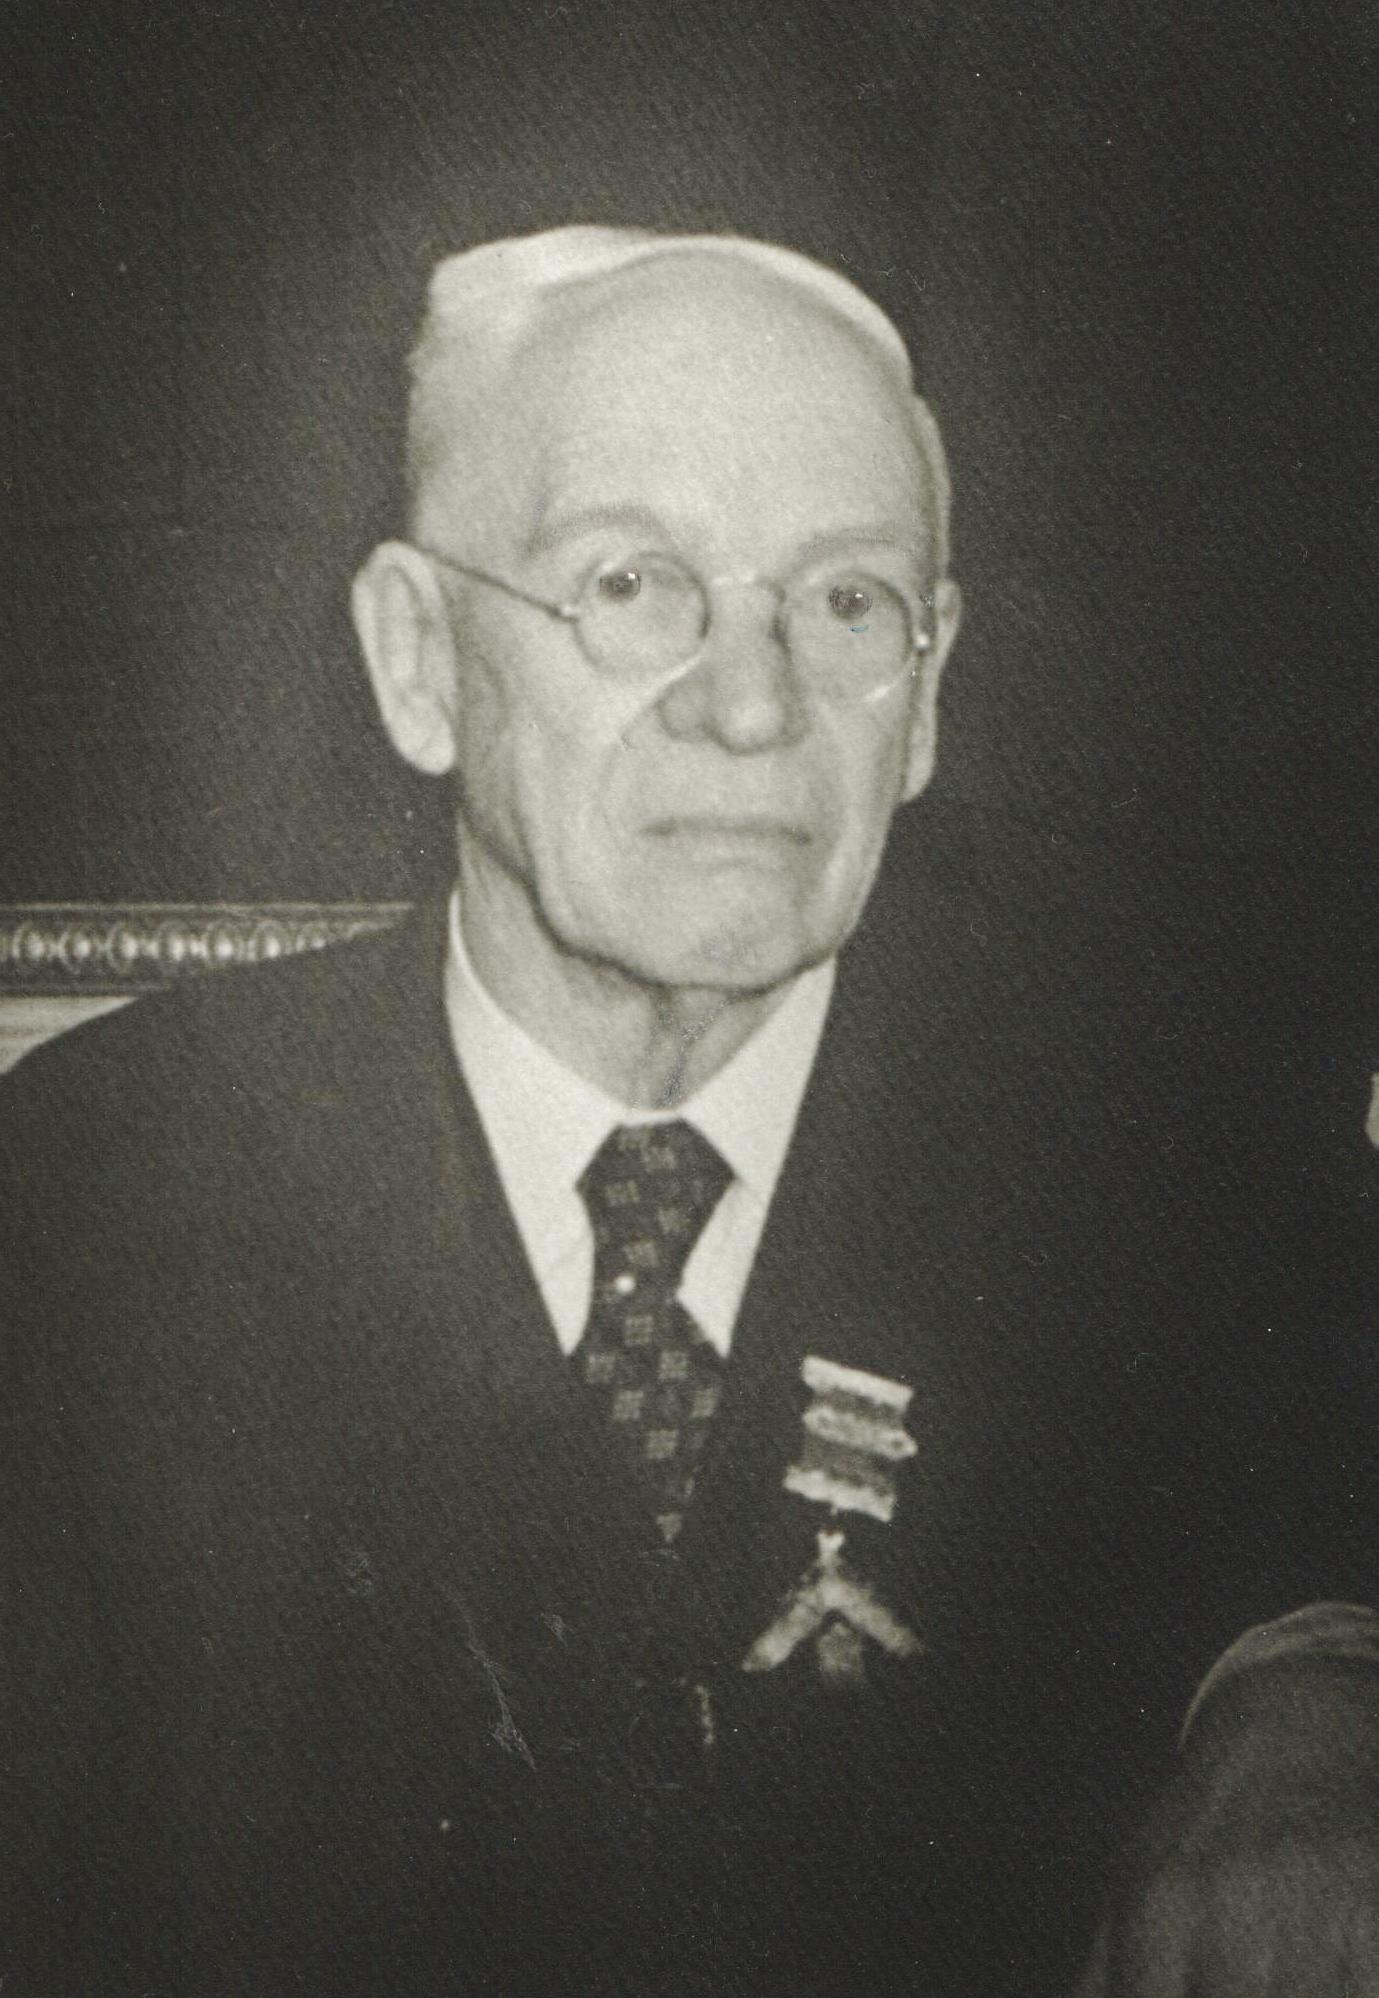 1903 A. C. Osborne